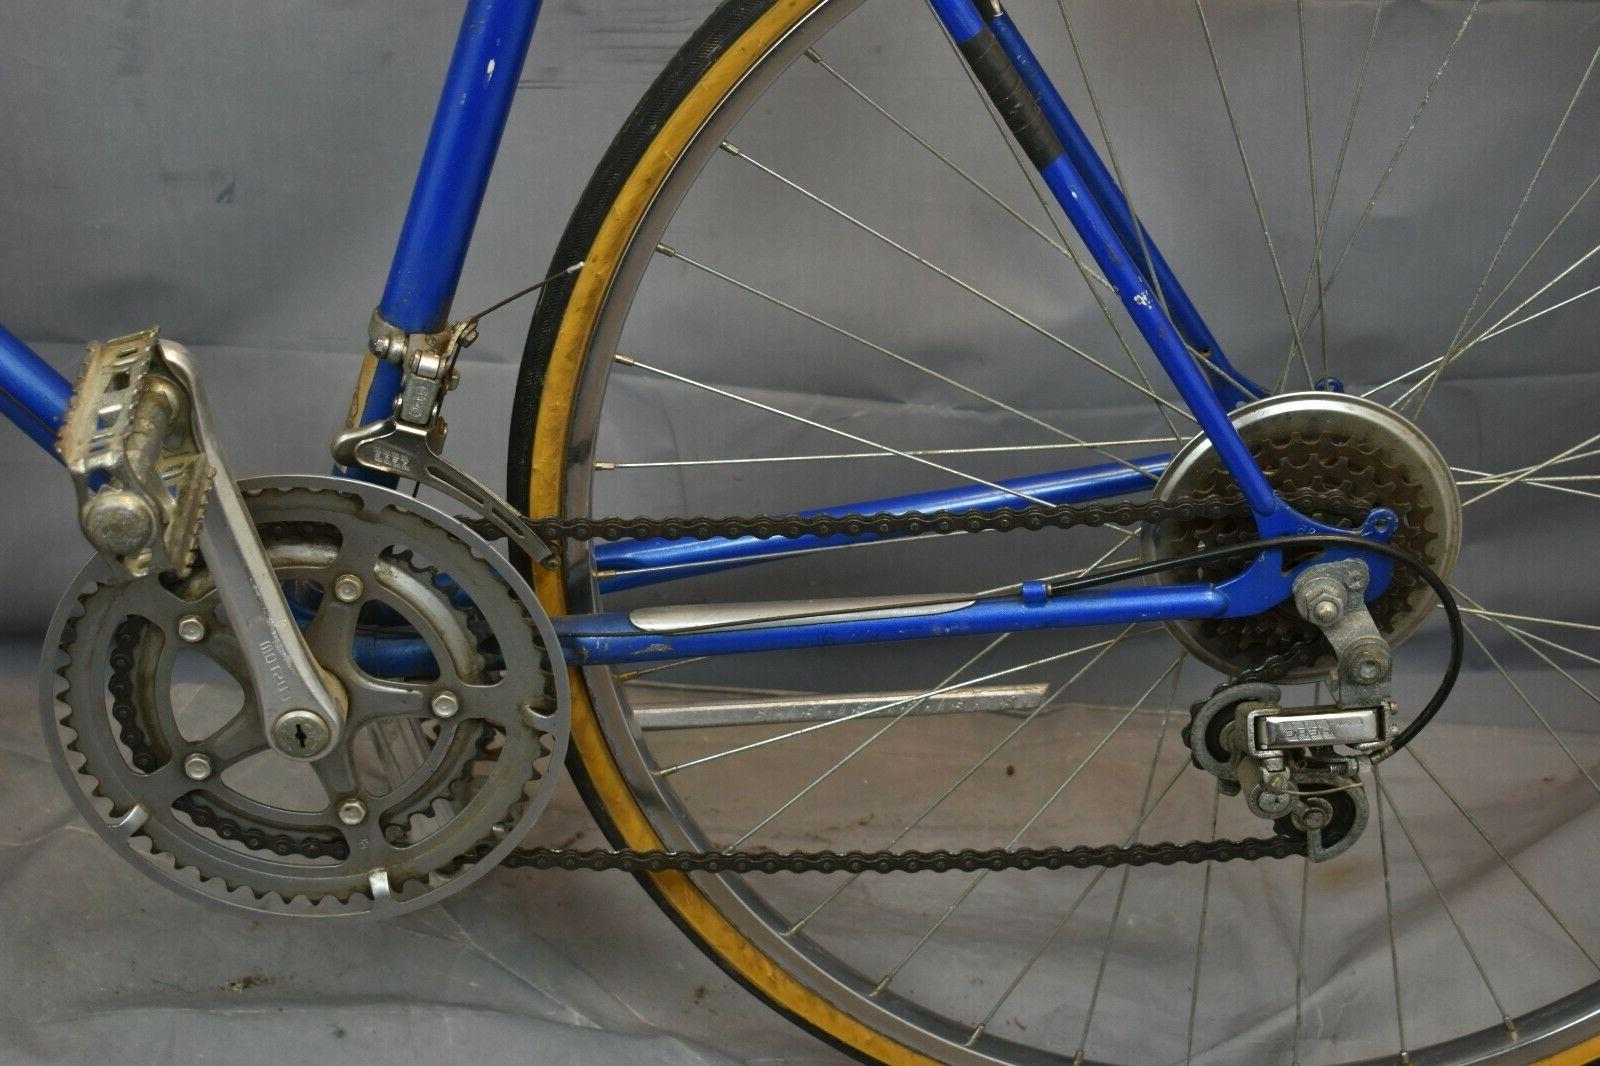 1985 Schwinn Sprint Touring Bike 55cm Charity!!